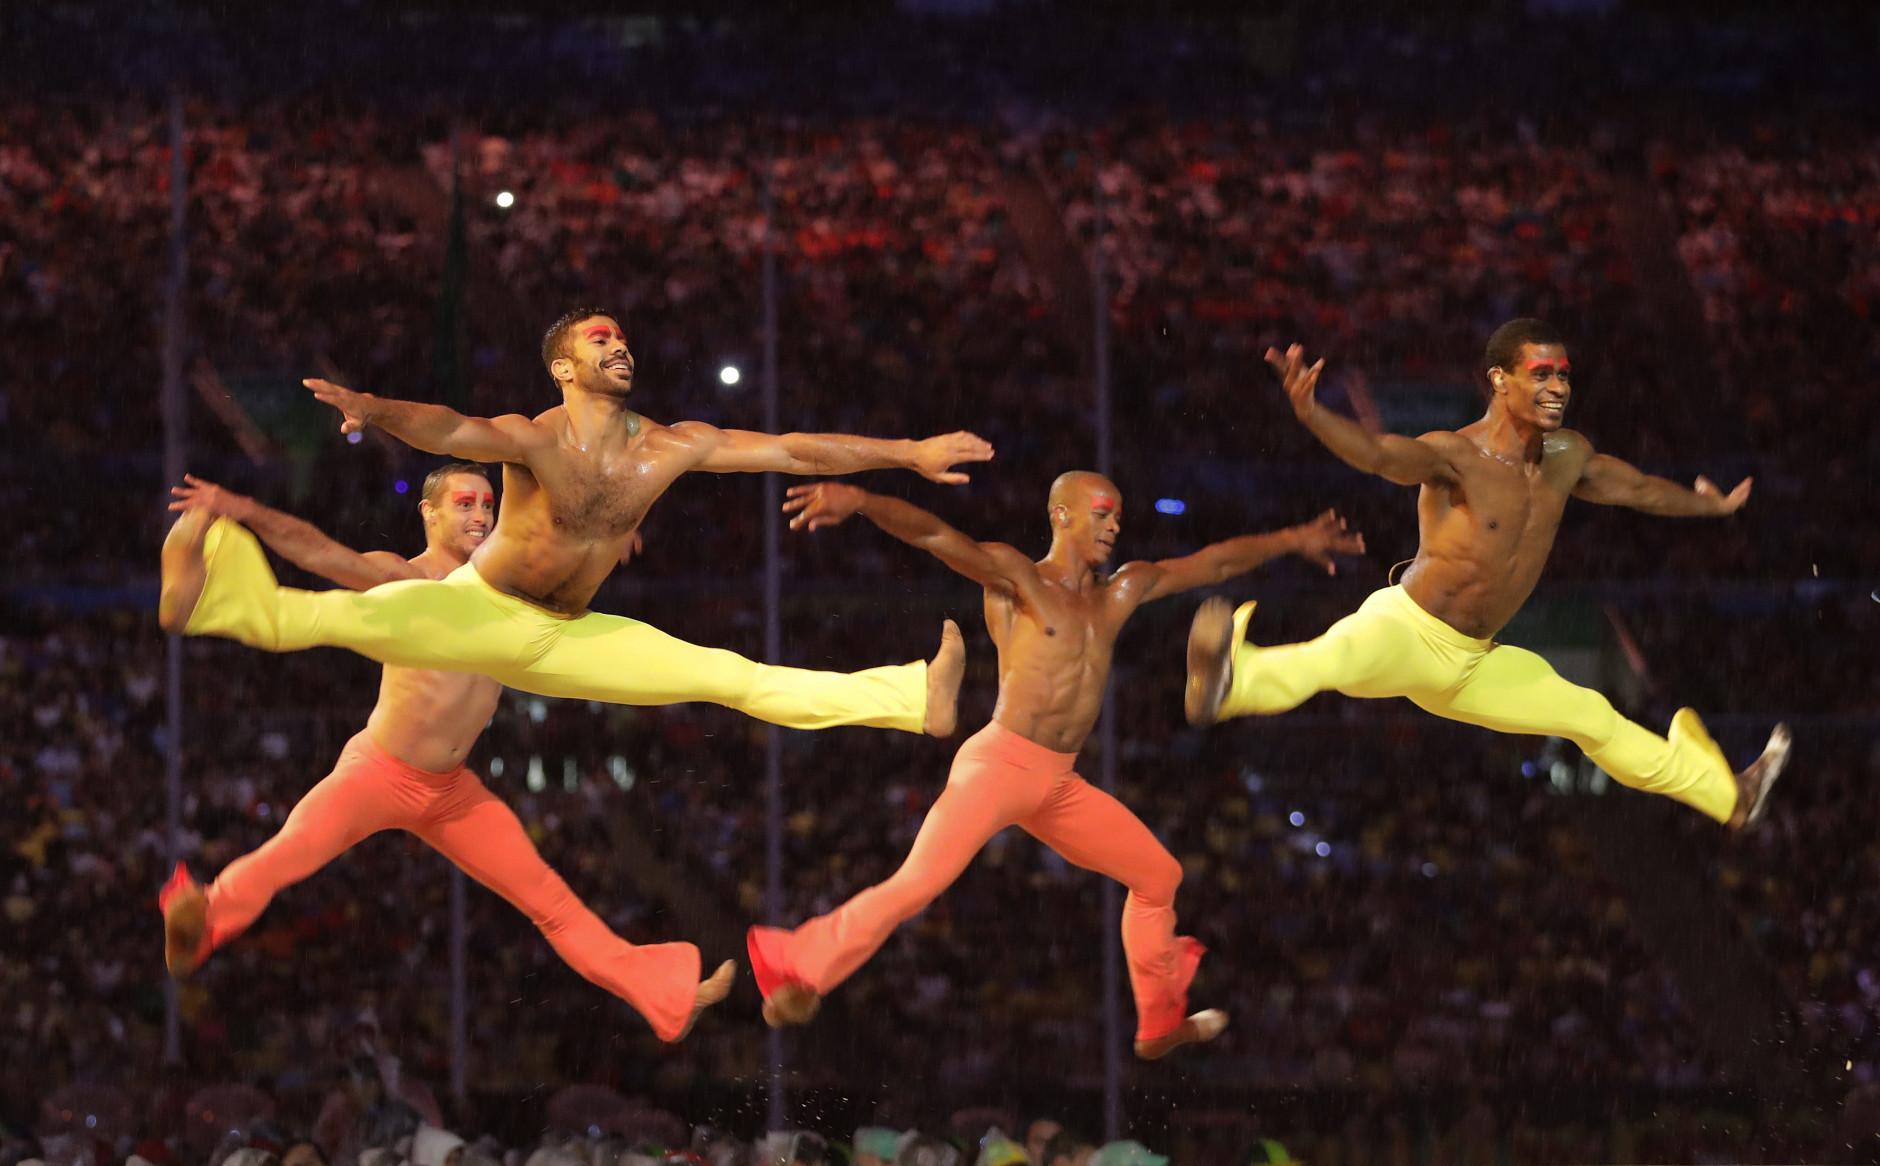 Dancers perform during the closing ceremony in the Maracana stadium at the 2016 Summer Olympics in Rio de Janeiro, Brazil, Sunday, Aug. 21, 2016. (AP Photo/David Goldman)